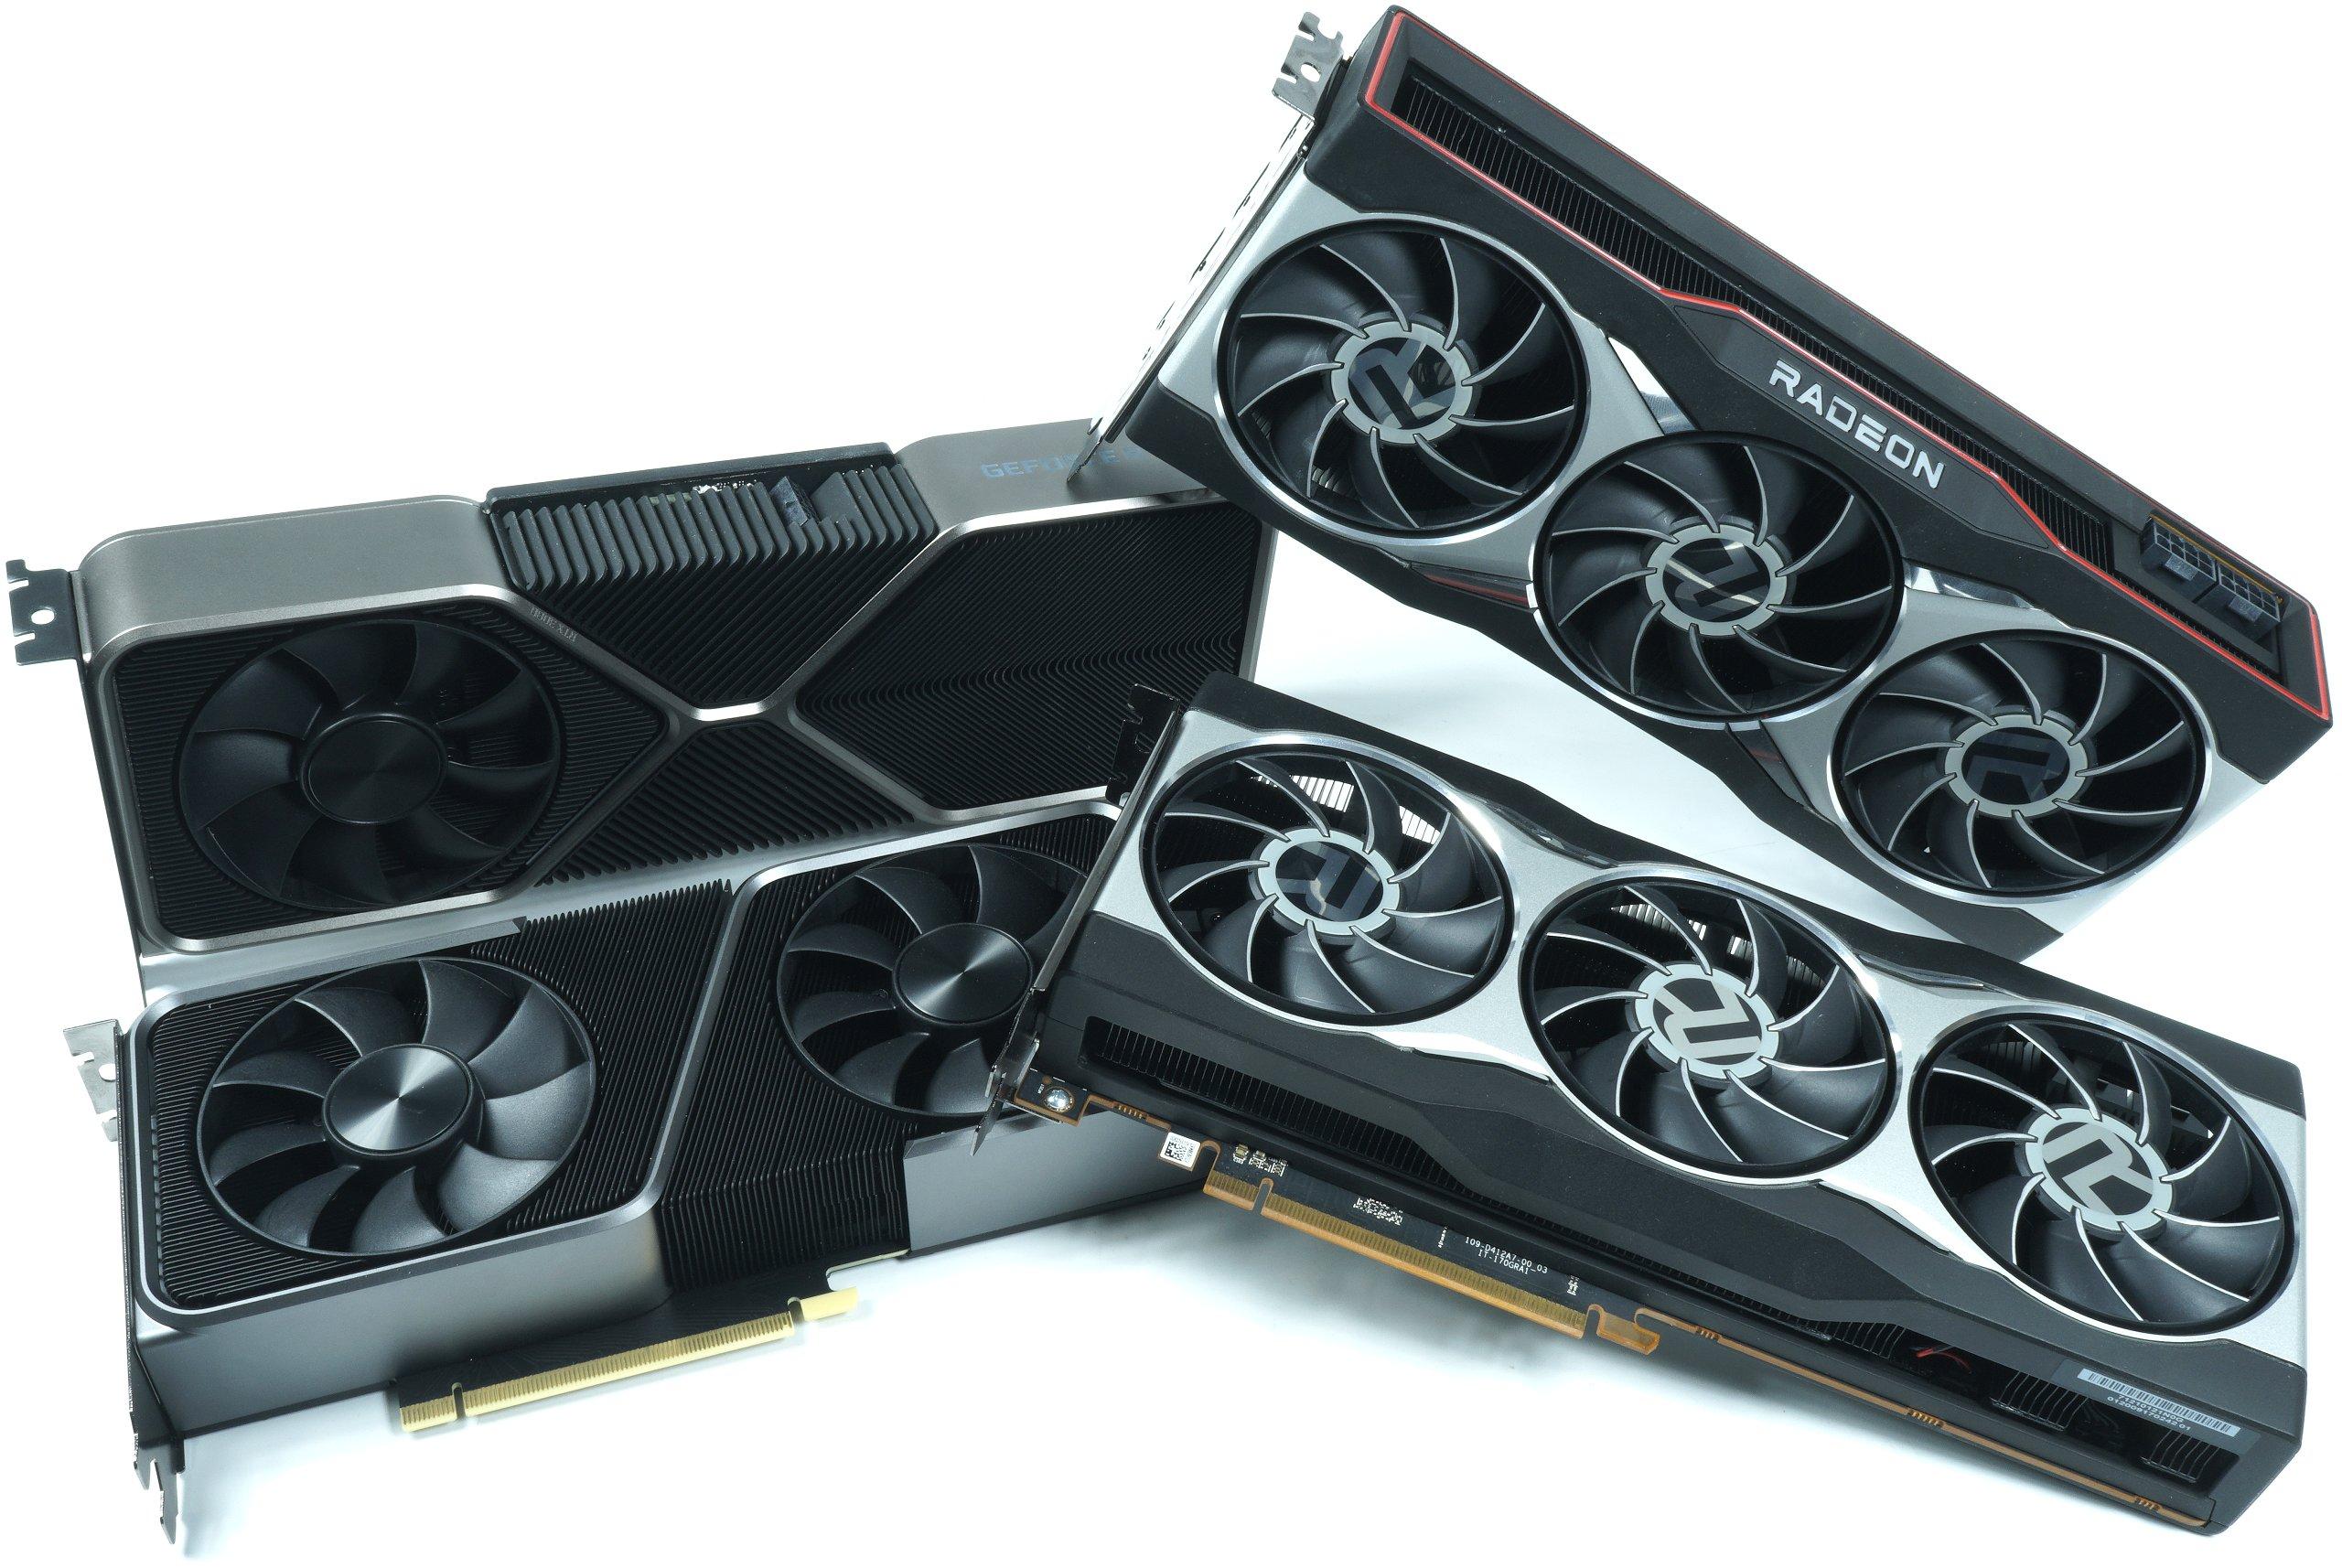 Nvidia GeForce GeForce RTX 3080 Ti dorazí až v únoru